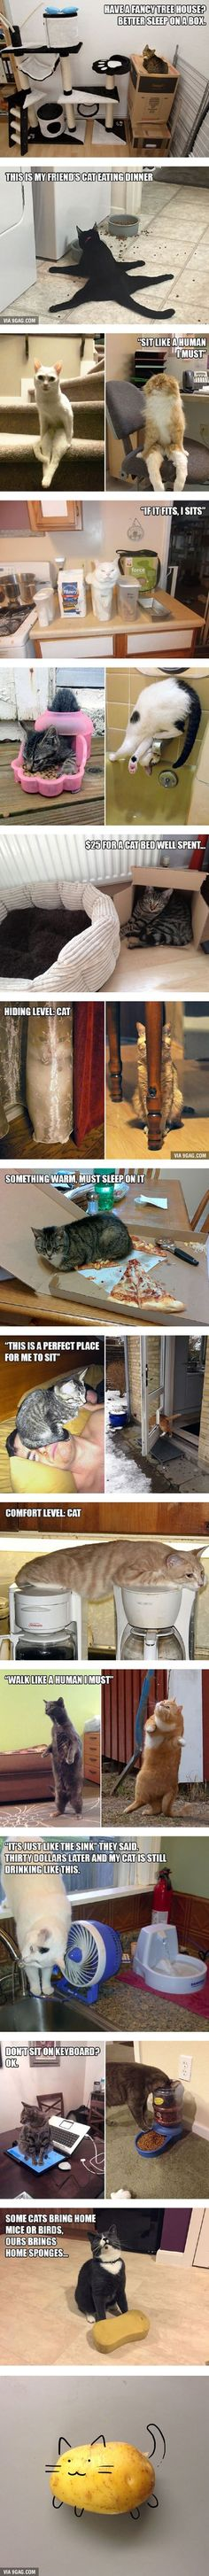 20 Funny Examples of Cat Logic - 9GAG http://ibeebz.com